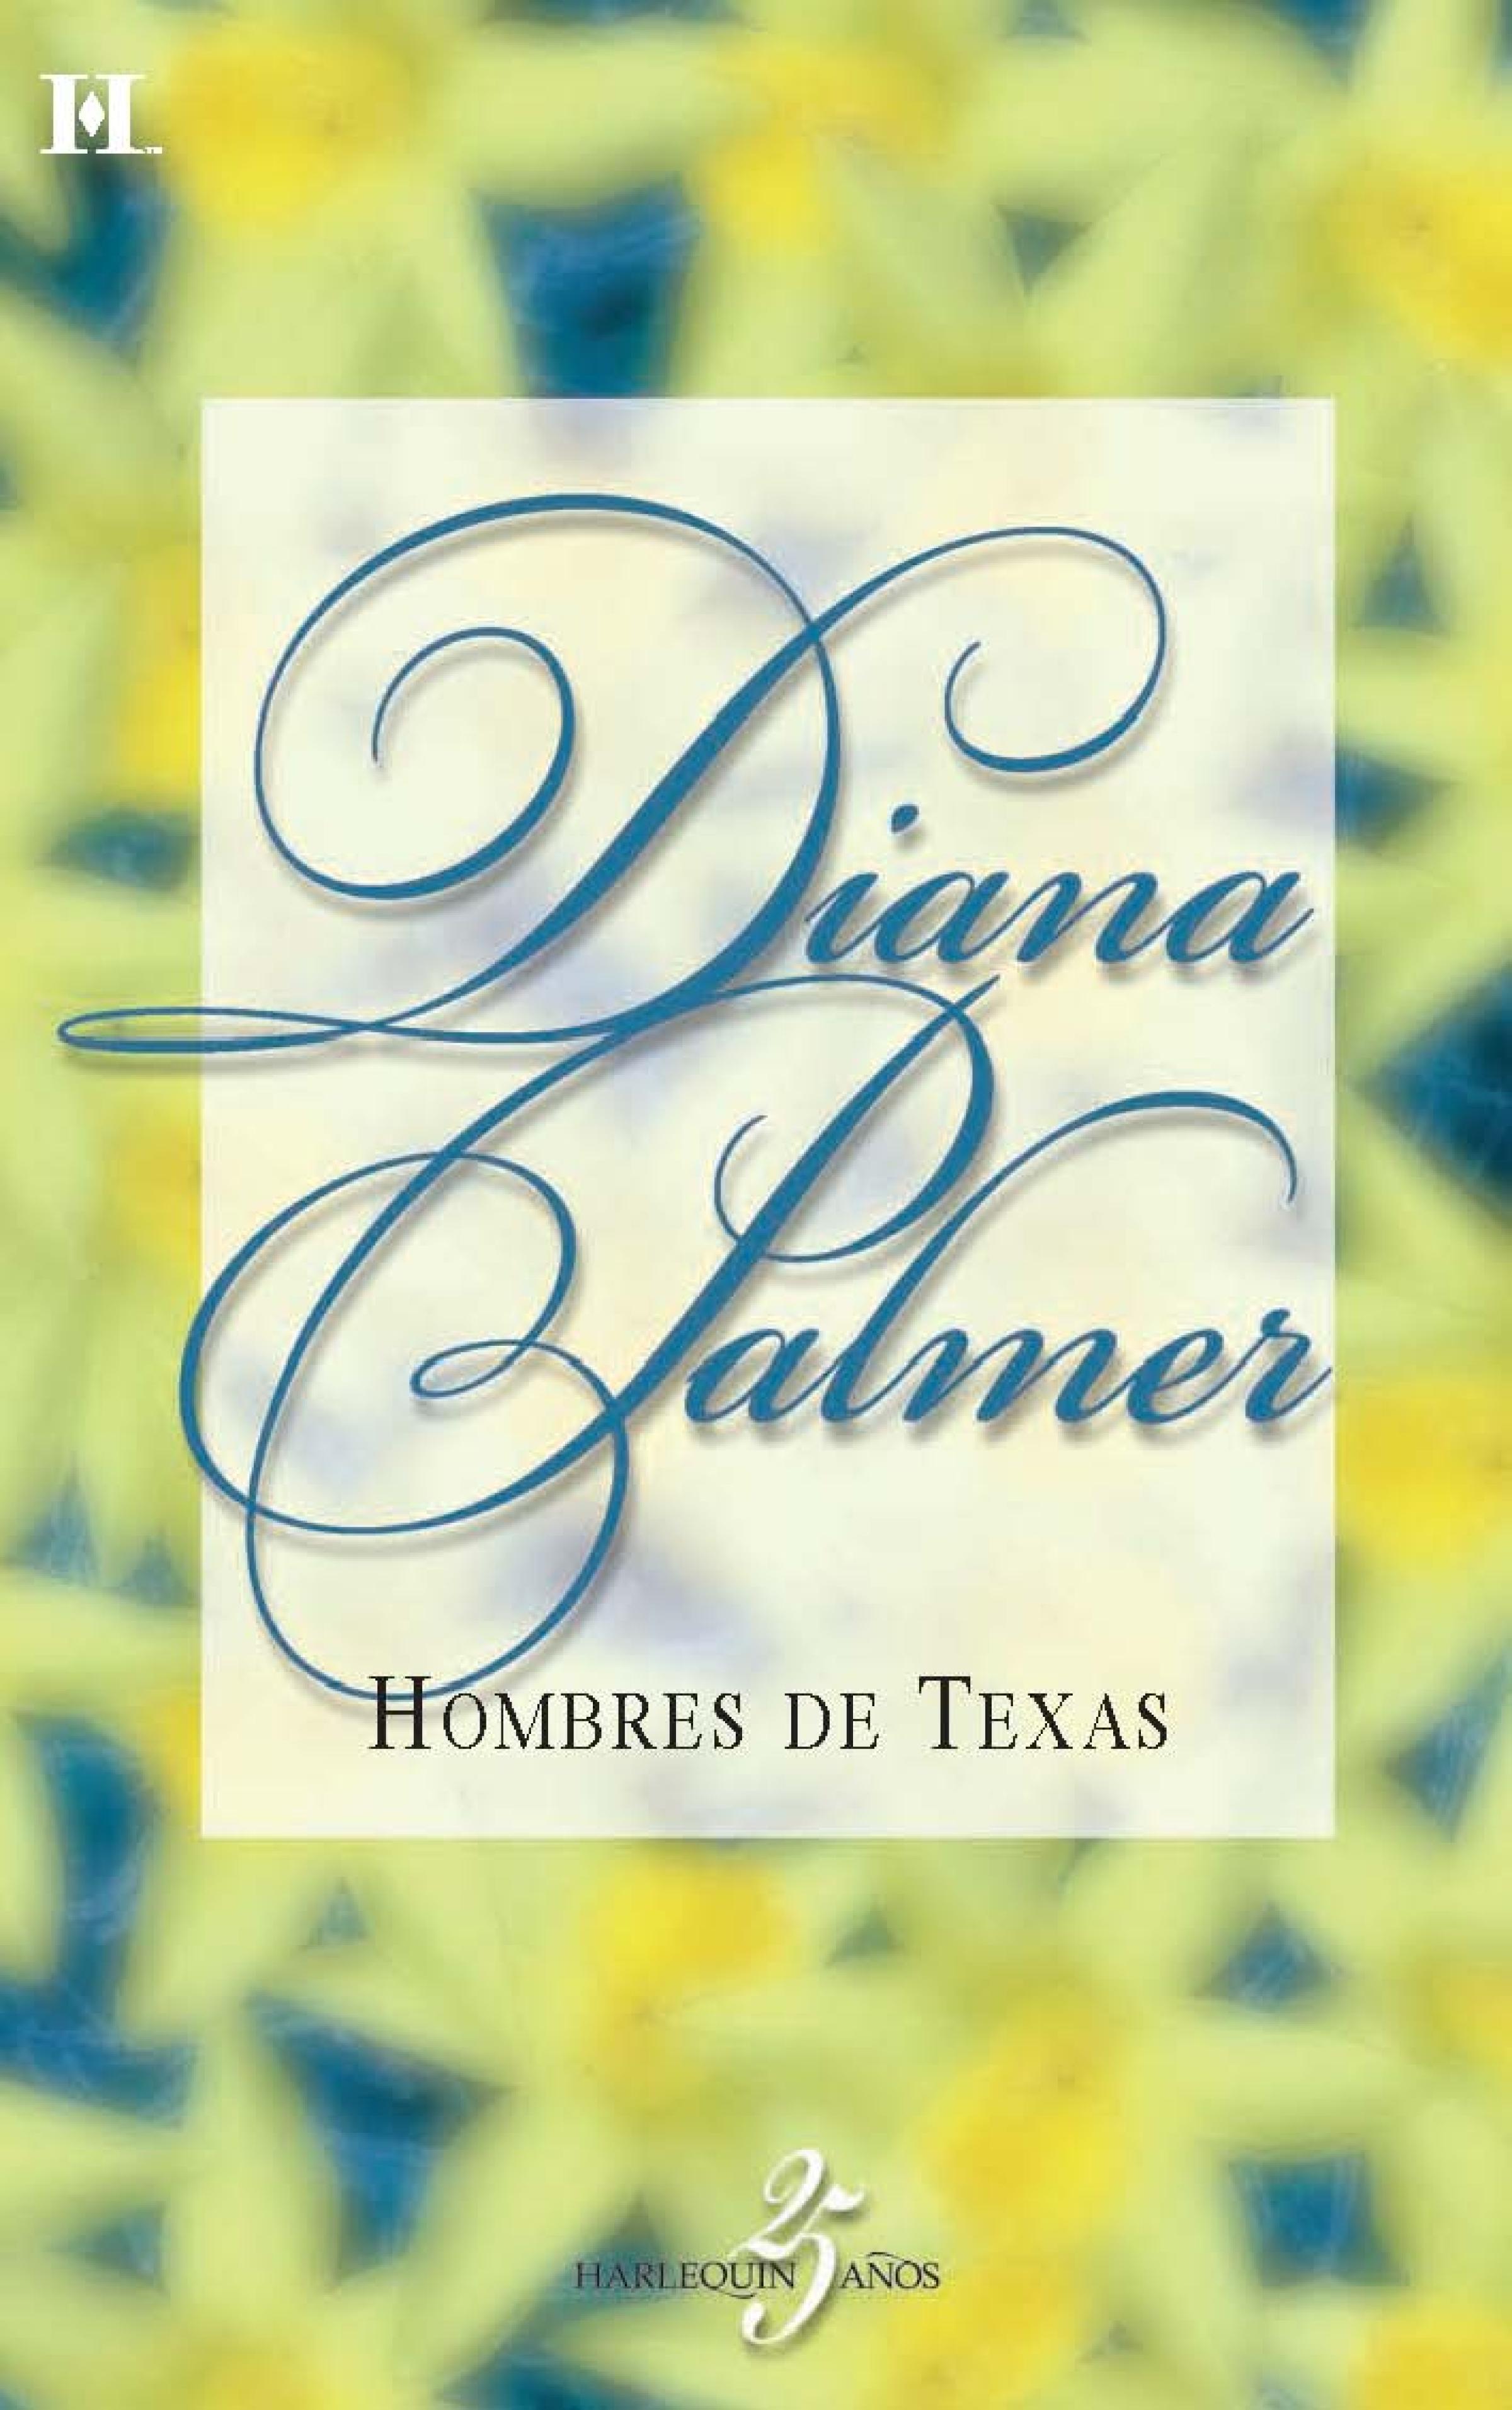 Diana Palmer Hombres de texas hombres de honor